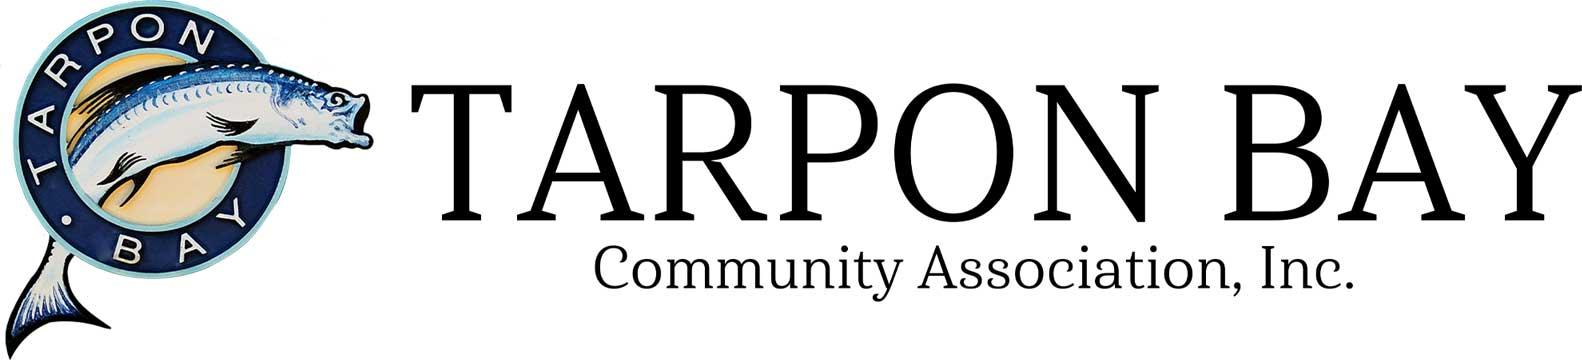 Tarpon Bay Community Association, Inc.